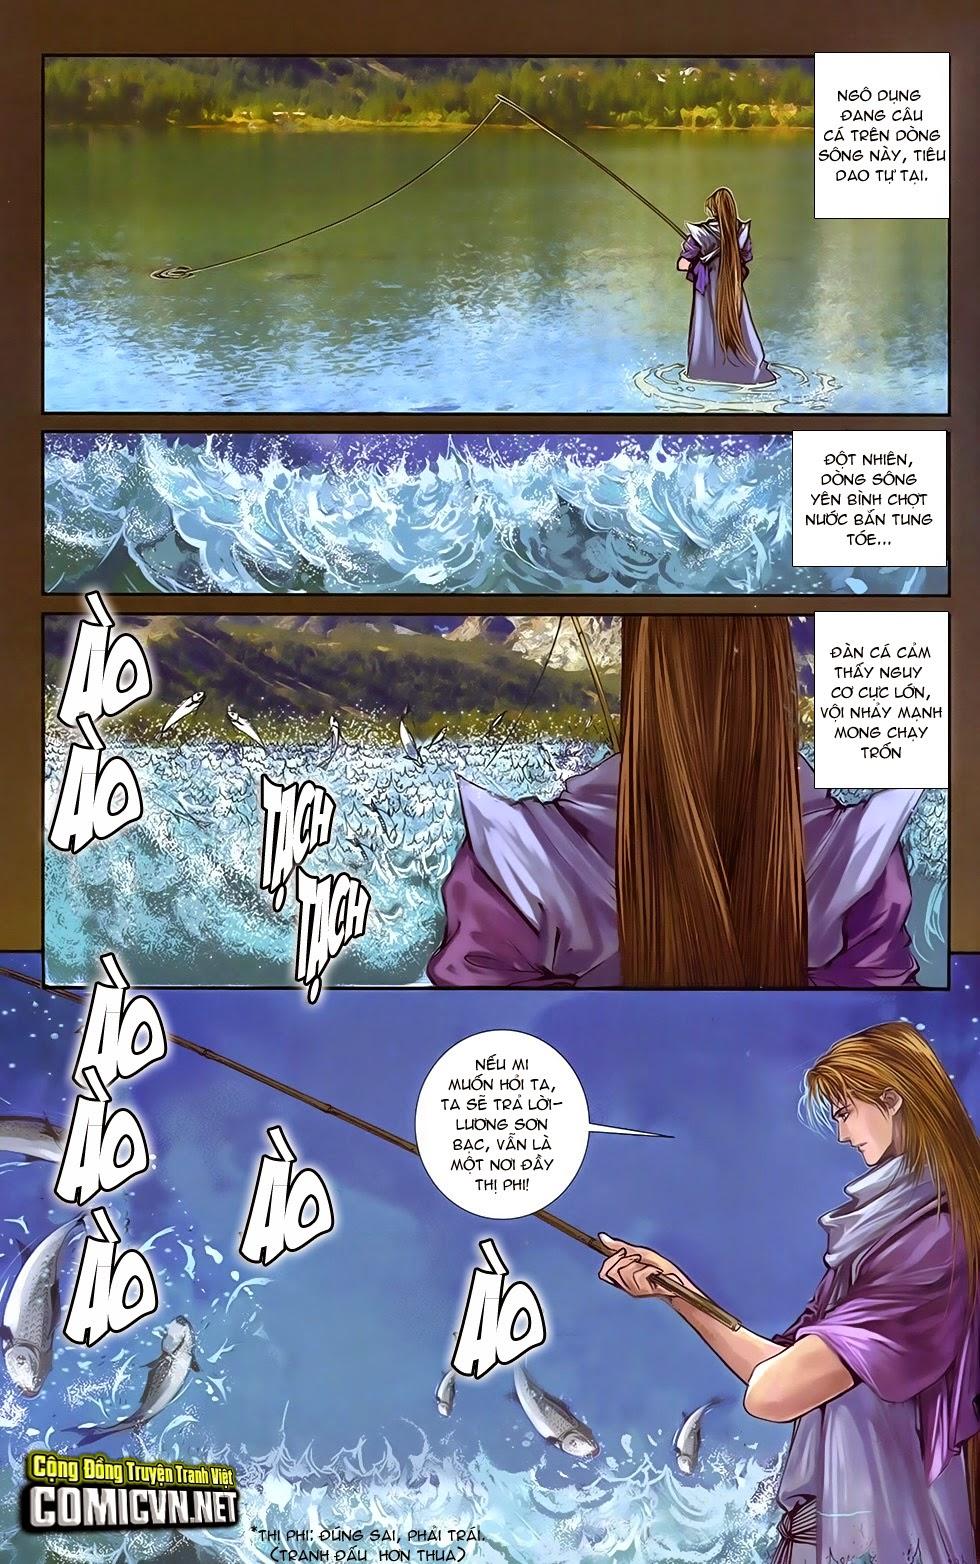 108 - Tân Thuỷ Hử  Chap 16-b - Truyenmoi.xyz